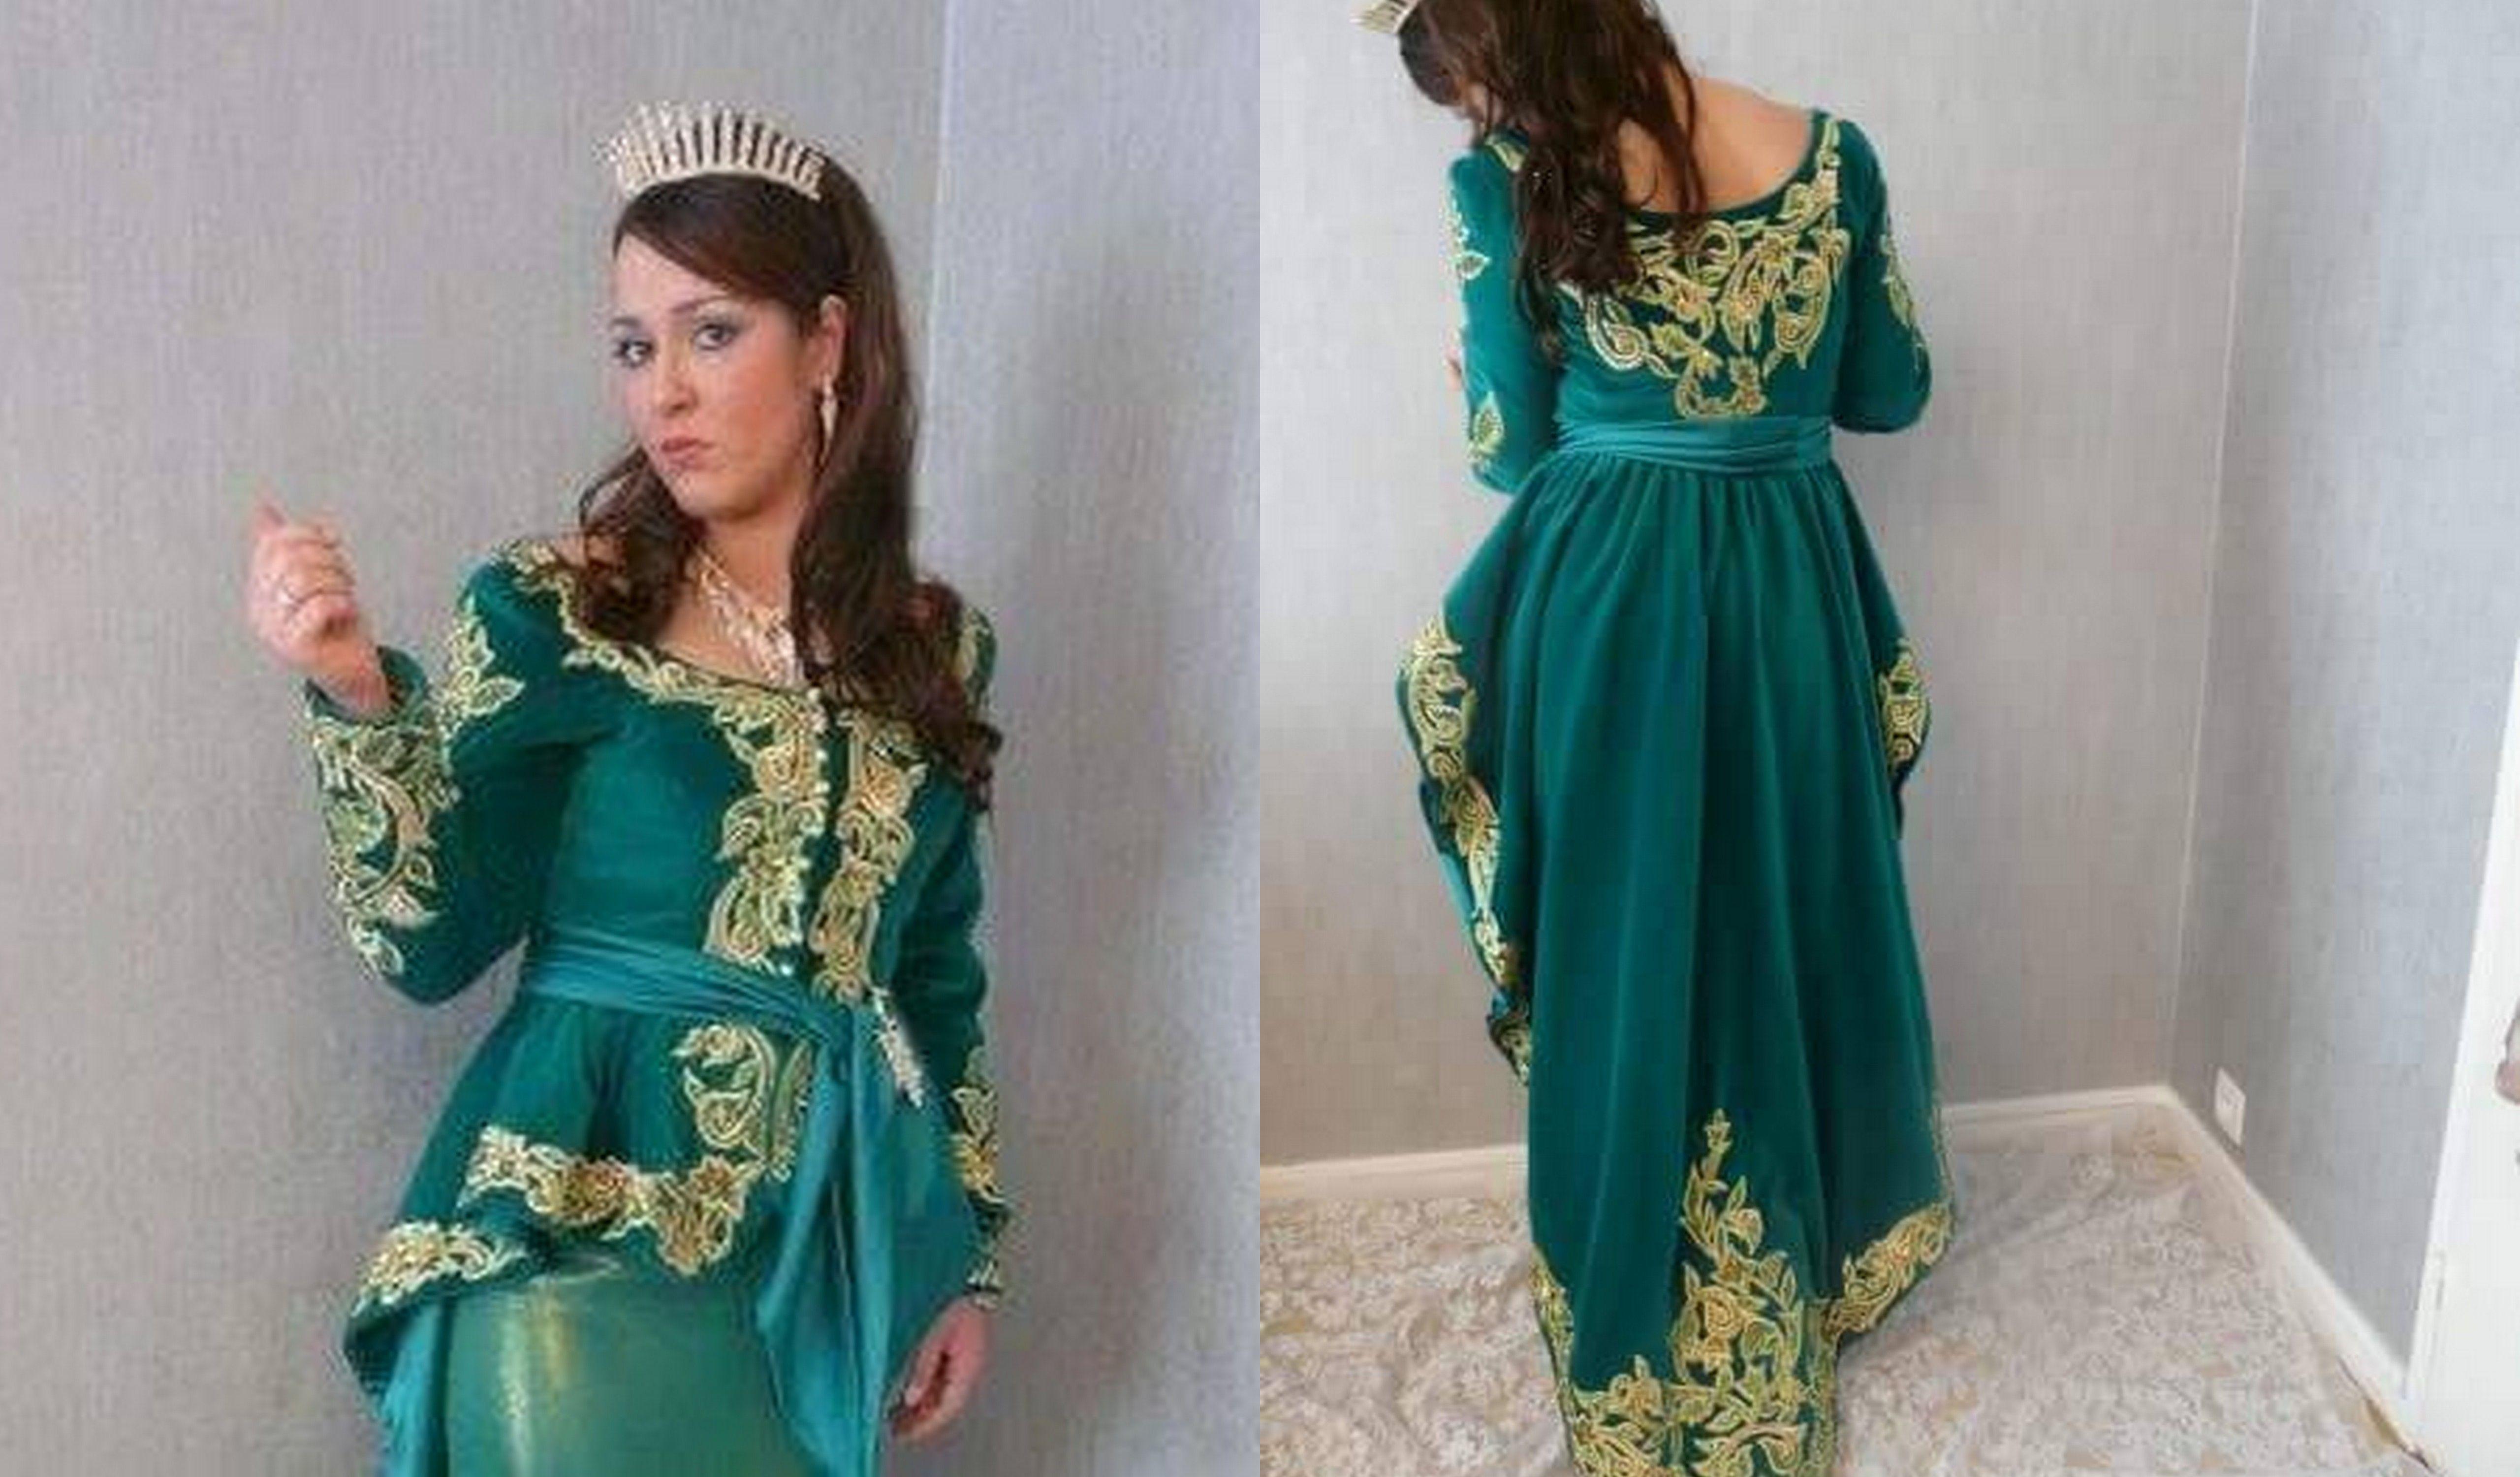 e957c55c9 للعروس   فساتين تصديرة جزائرية